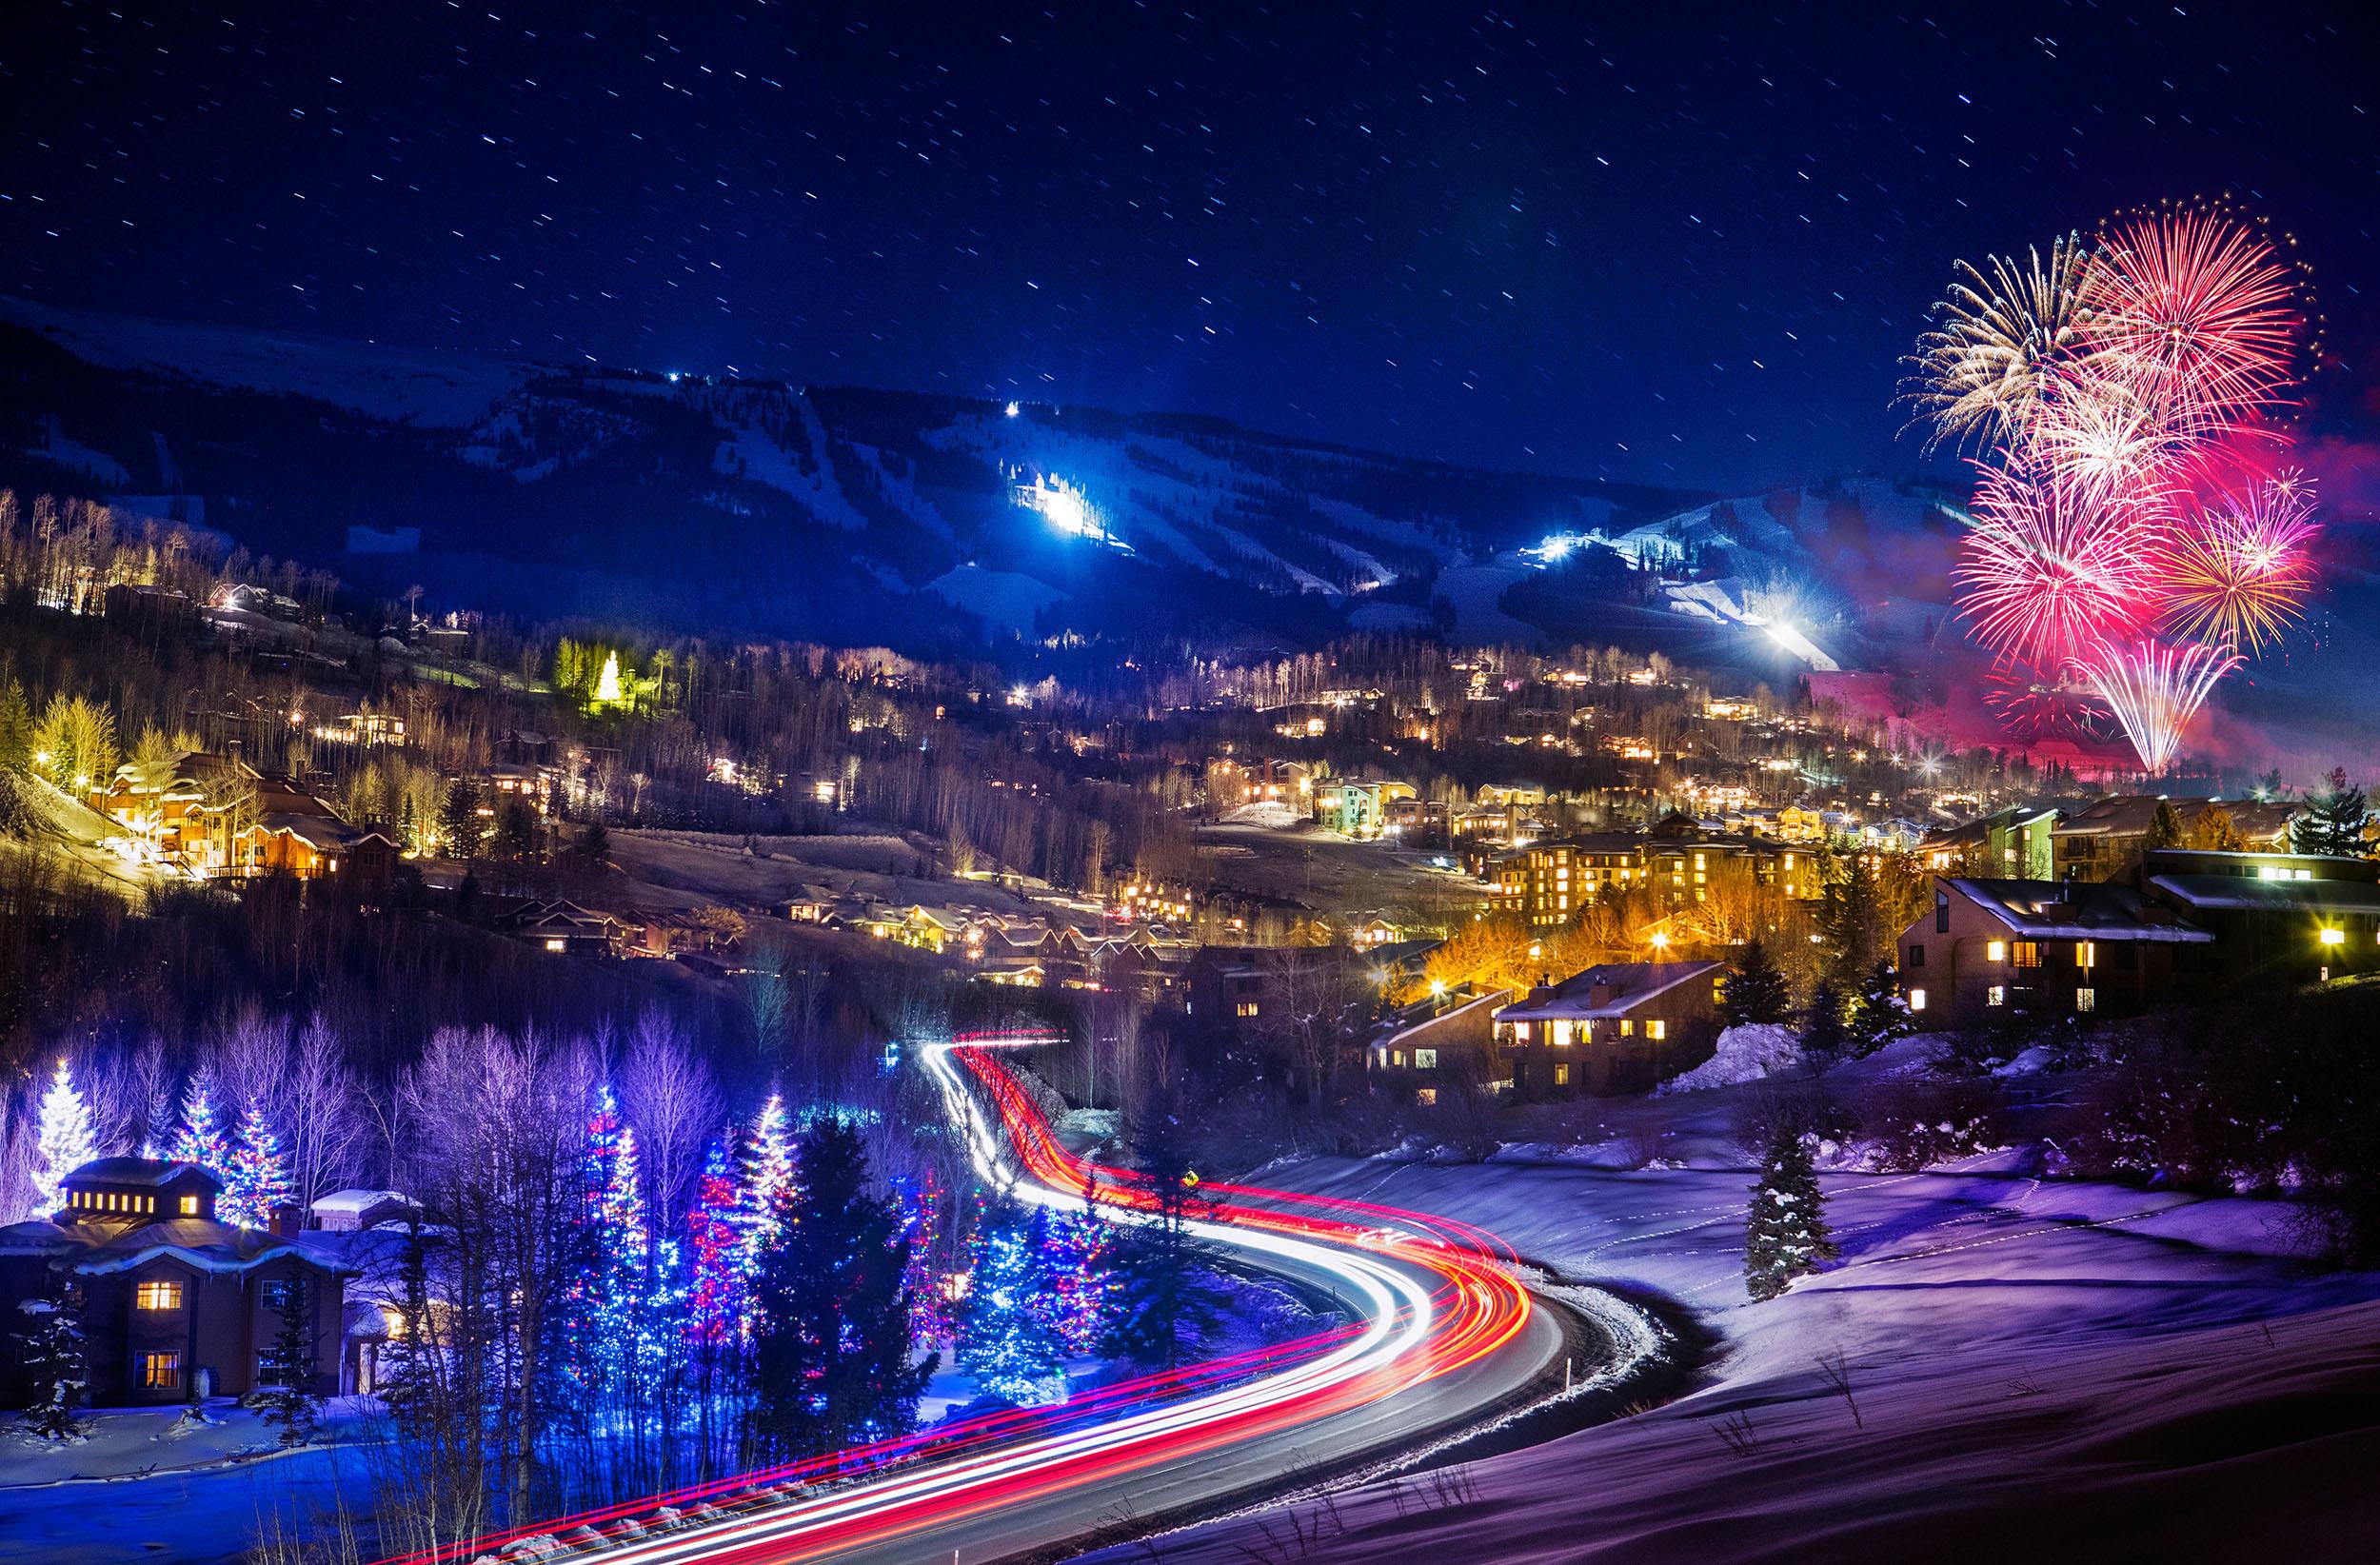 Snowmass Village Fireworks by Jeremy Swanson